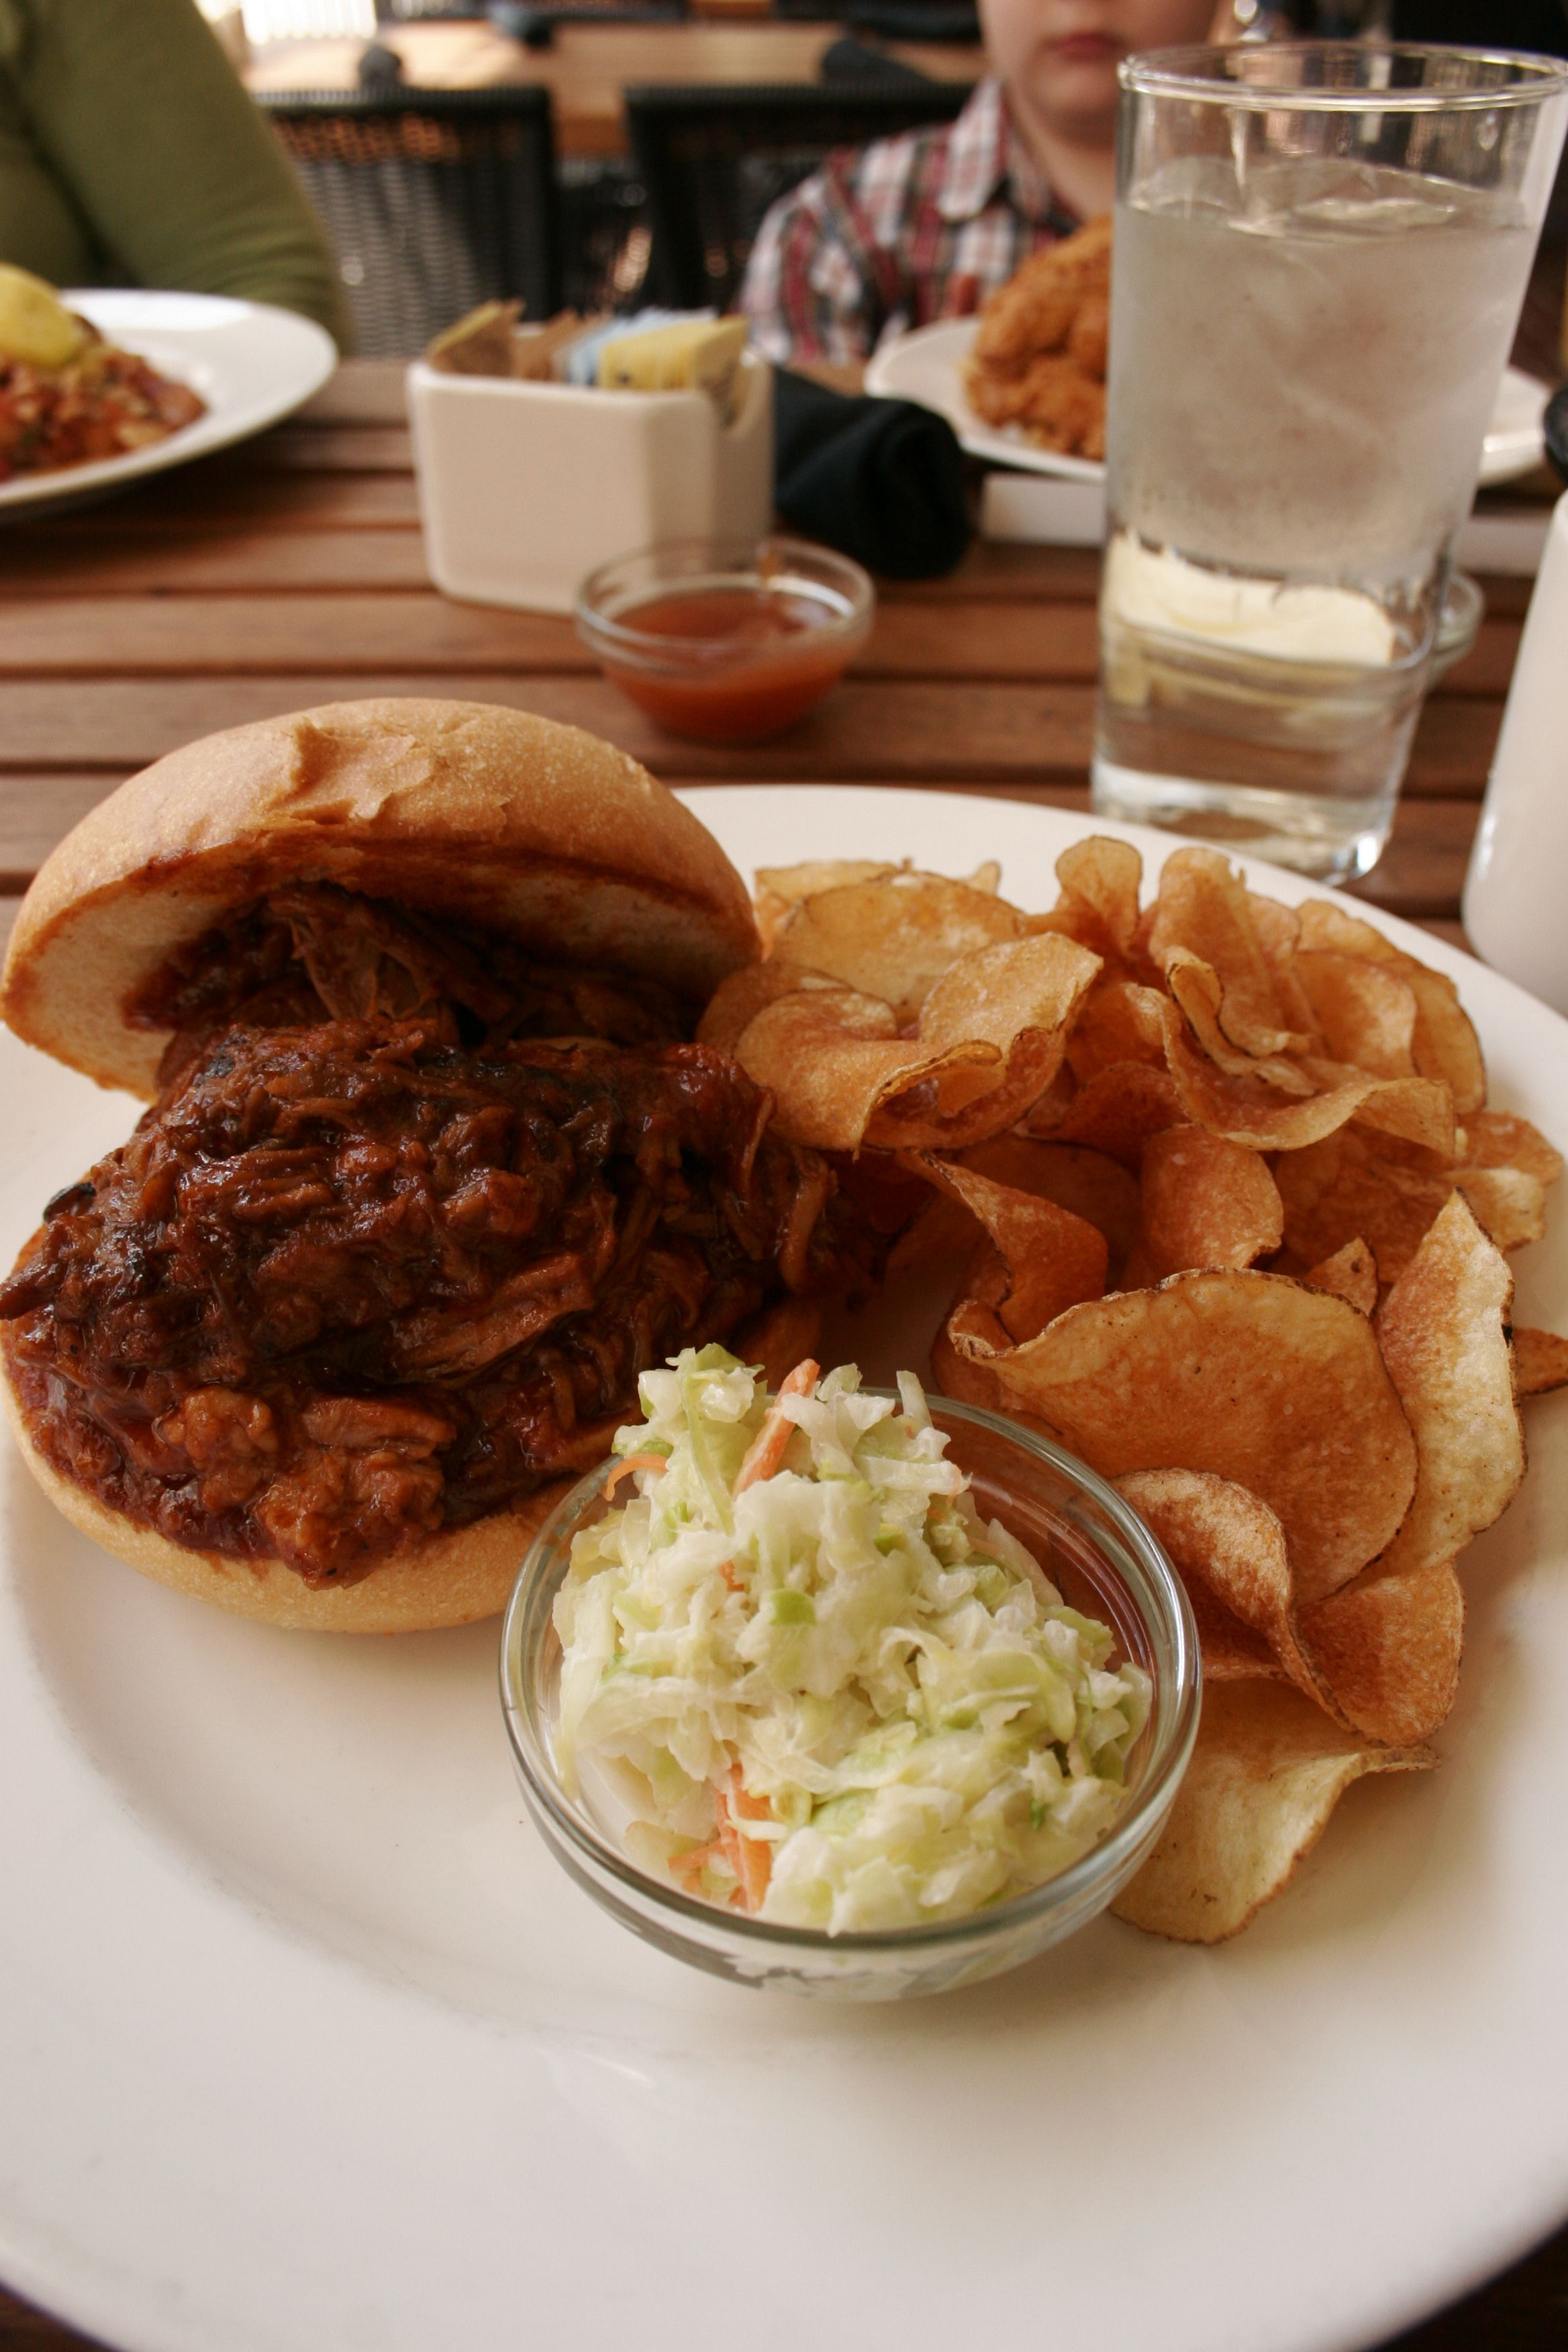 BBQ pork sandwich | South City Kitchen Midtown | South city ...